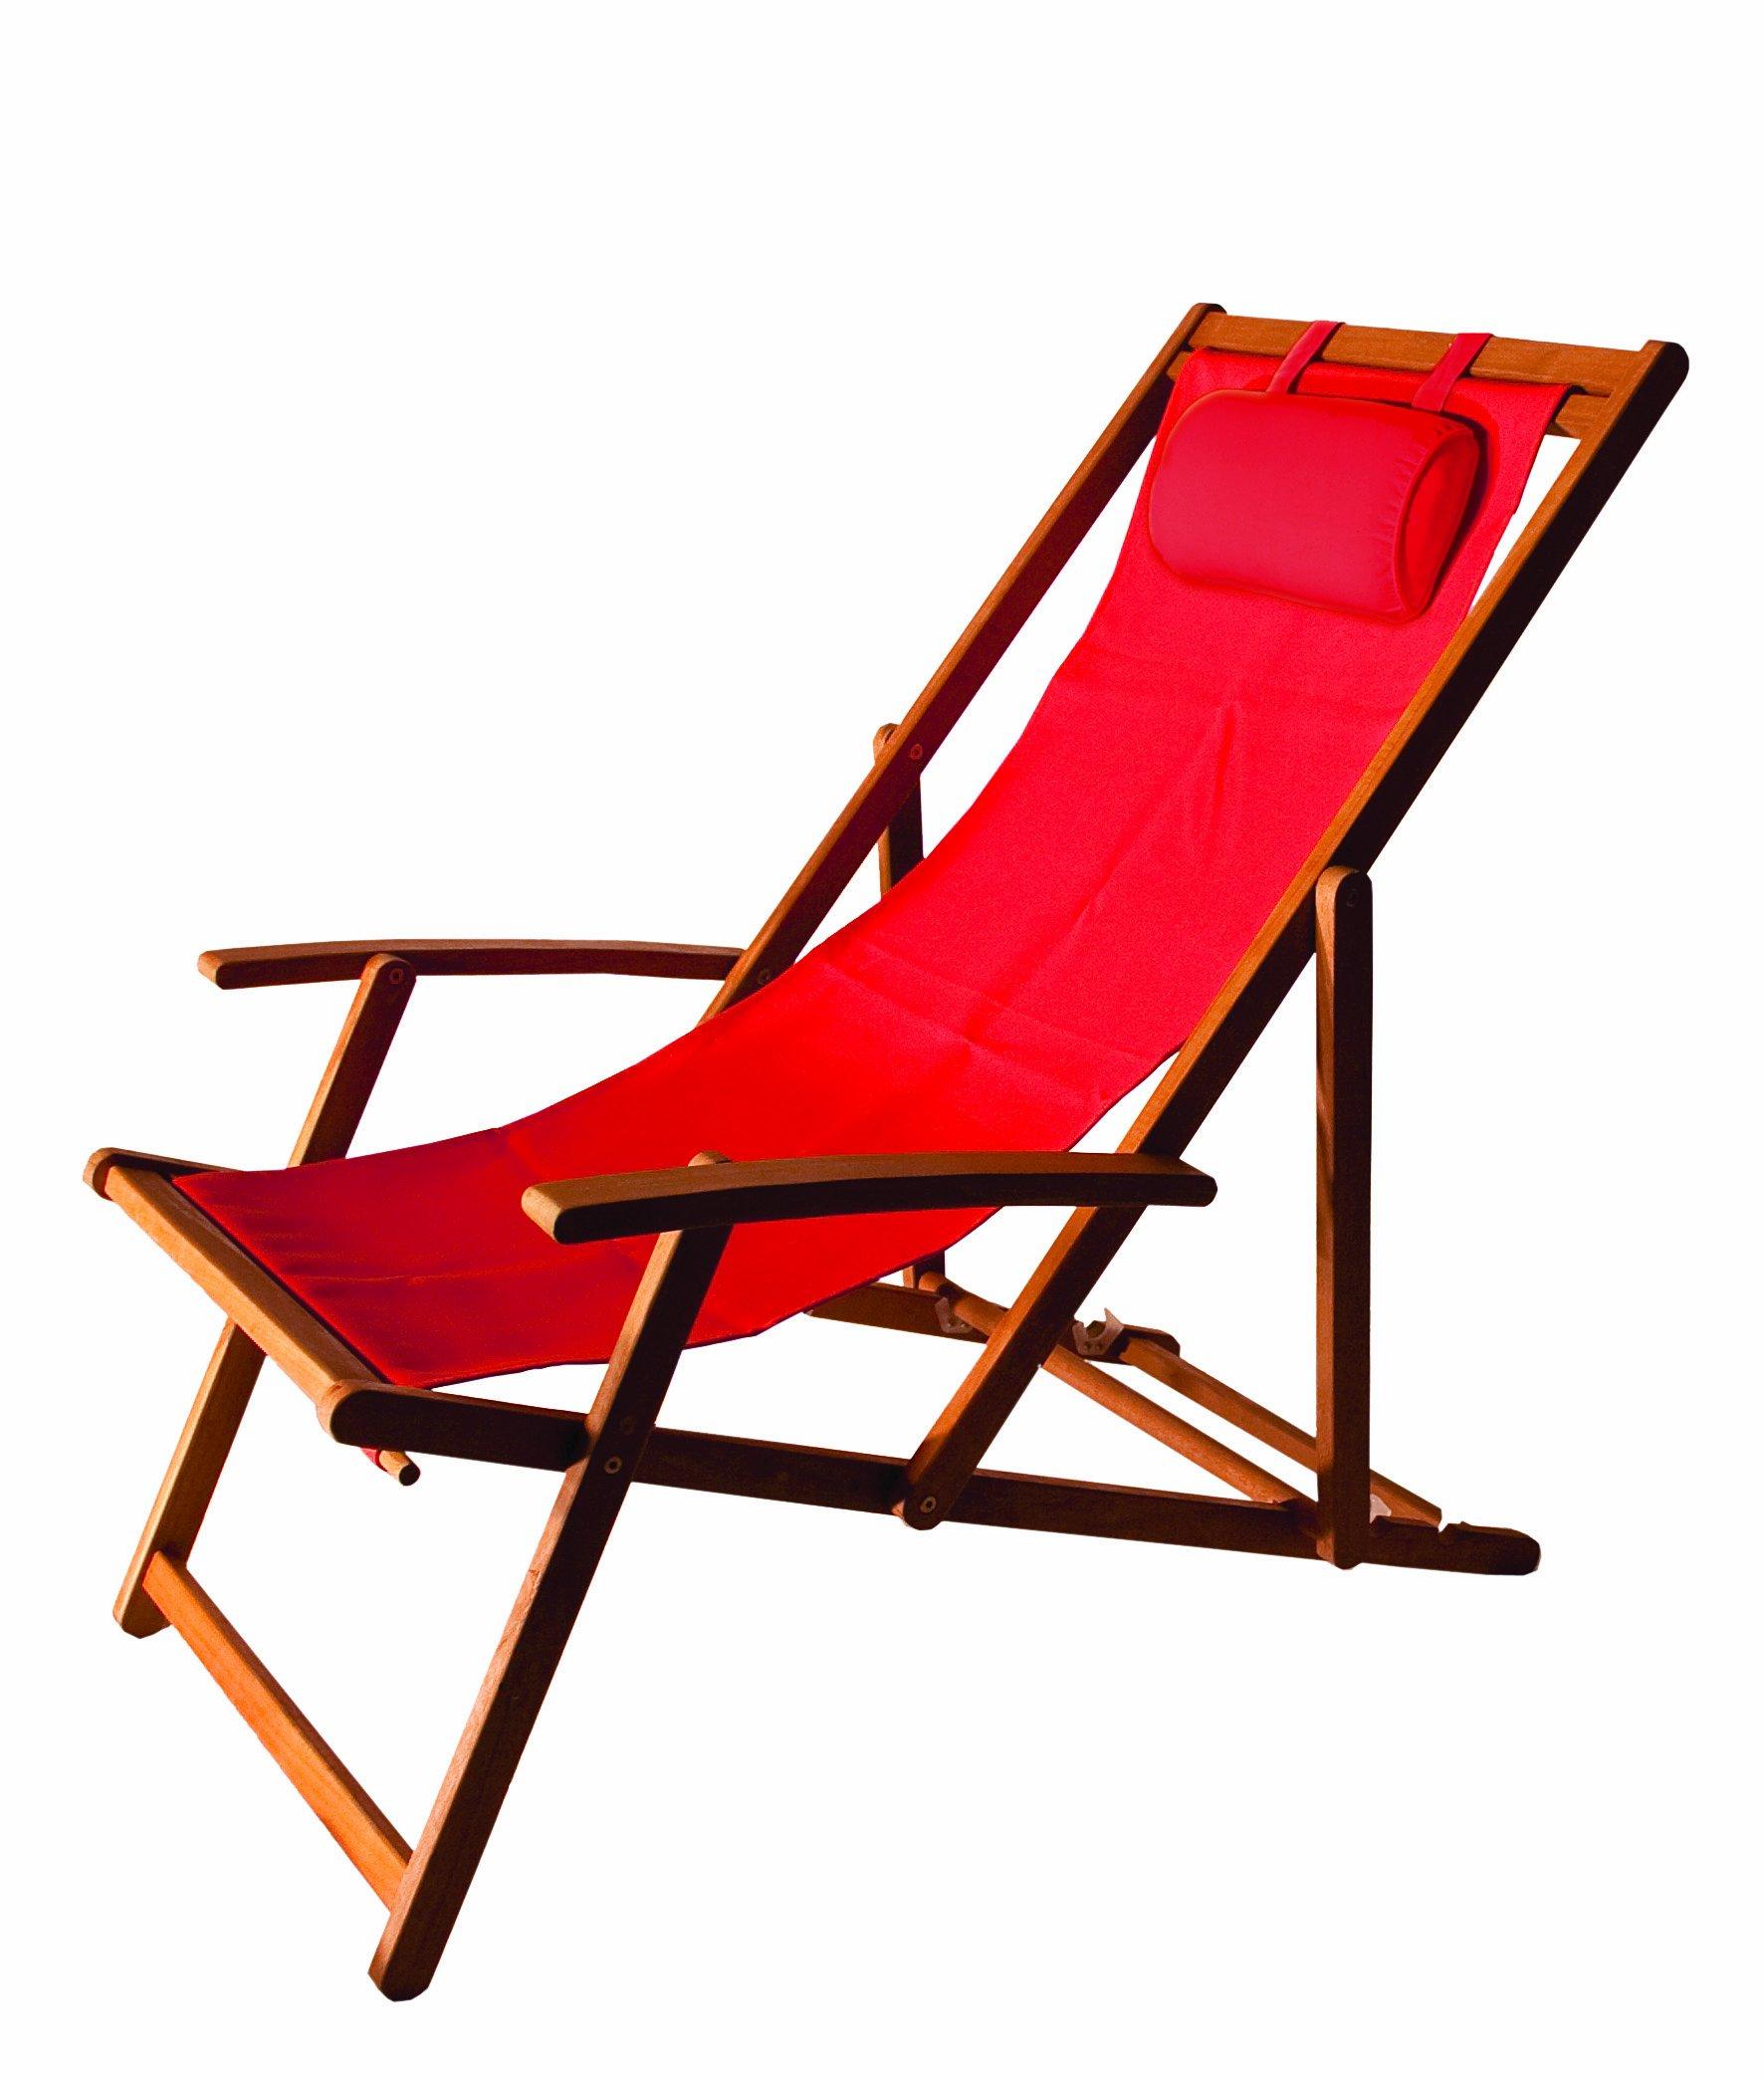 ARBORIA Foldable Outdoor Wood Sling Chair Eucalyptus Hardwood, Red